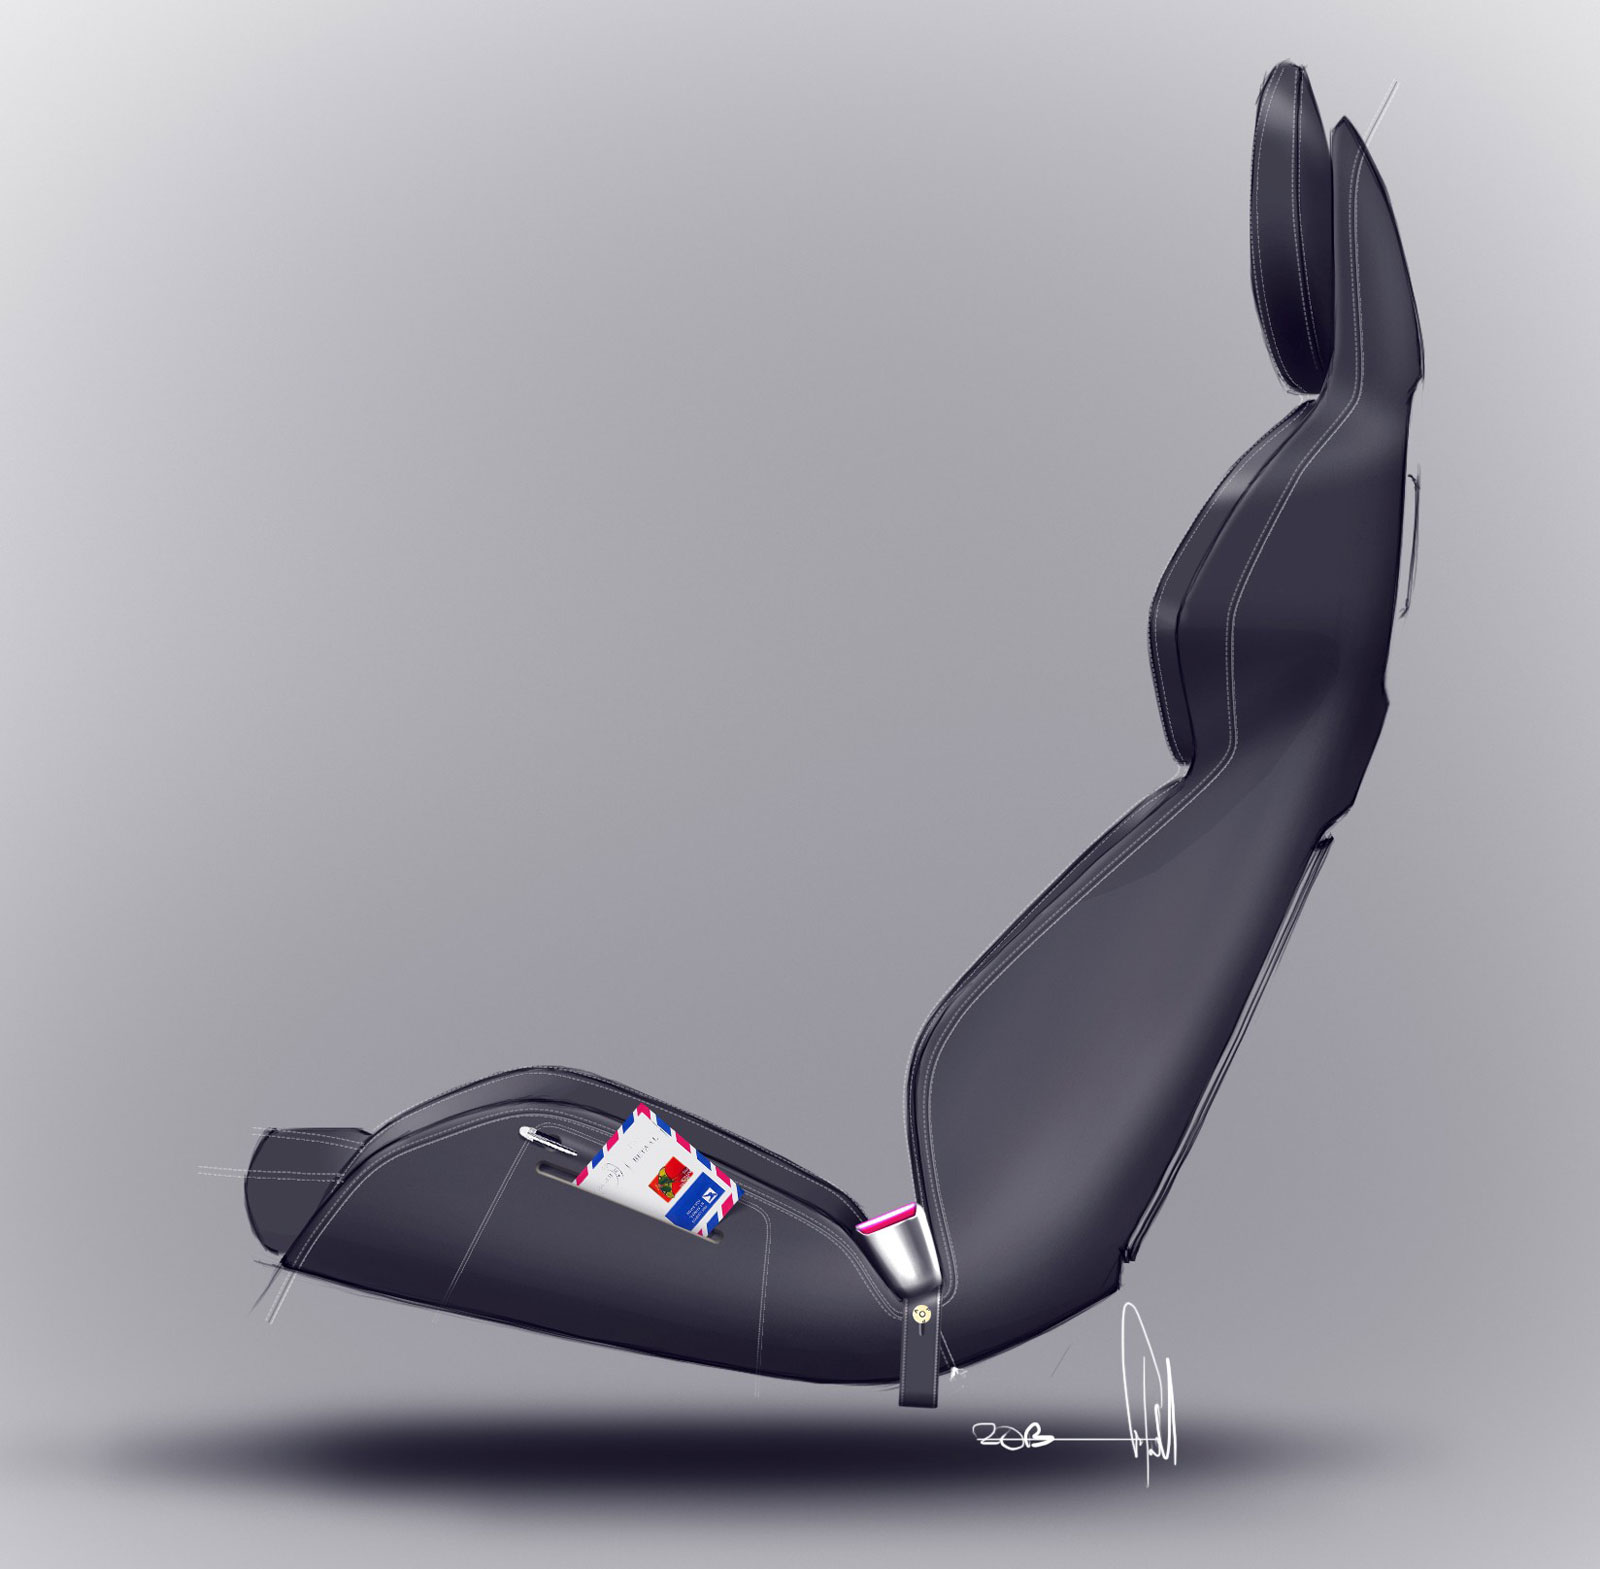 Car Interior Design: Volvo Concept Coupe Interior Seat Design Sketch